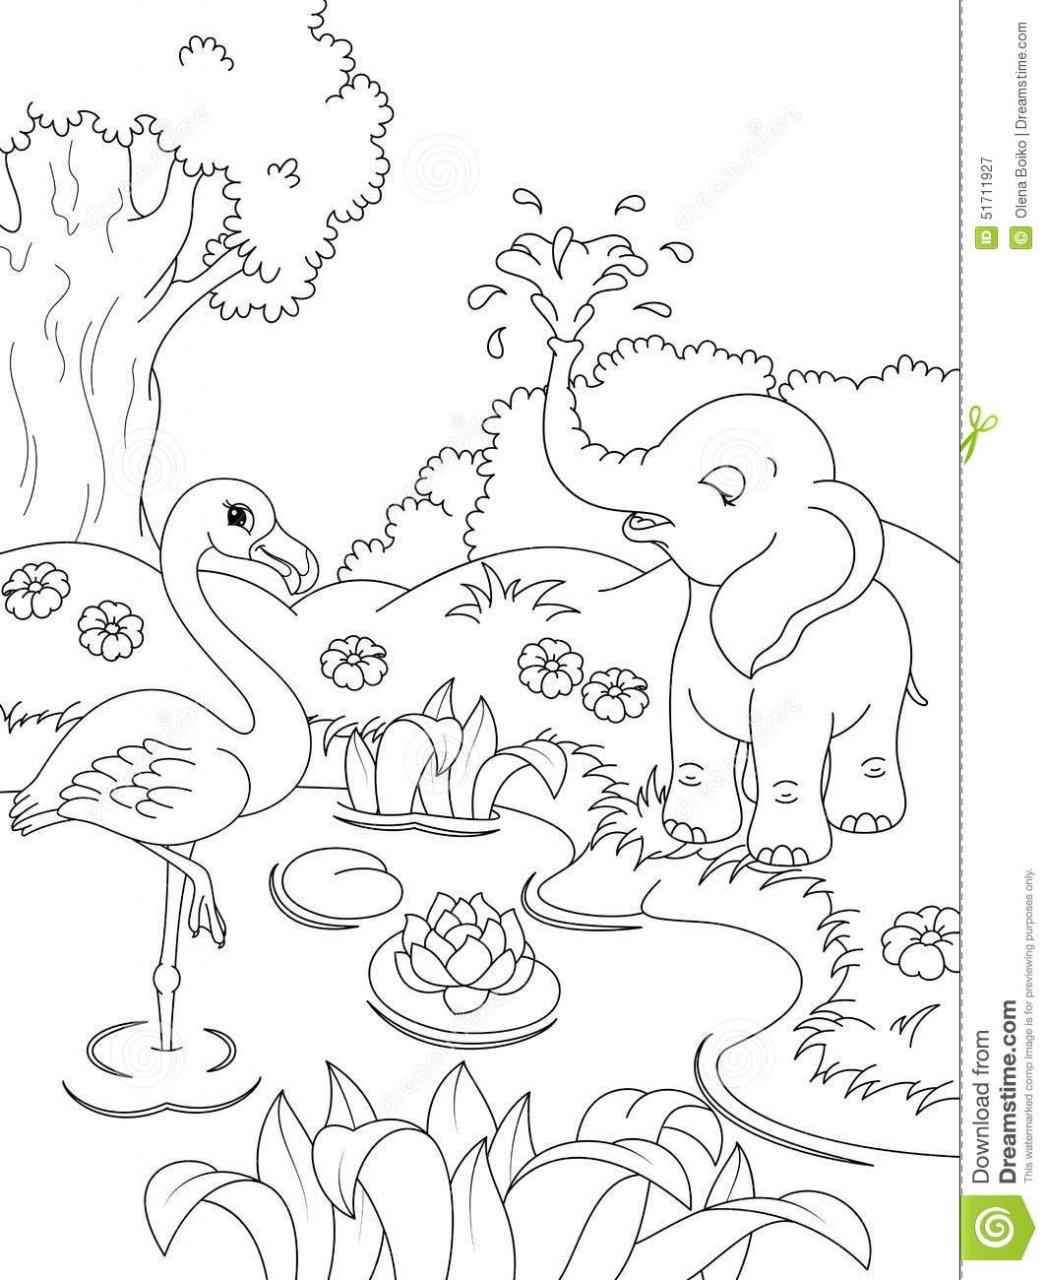 Nature Scenes Drawing At Getdrawings